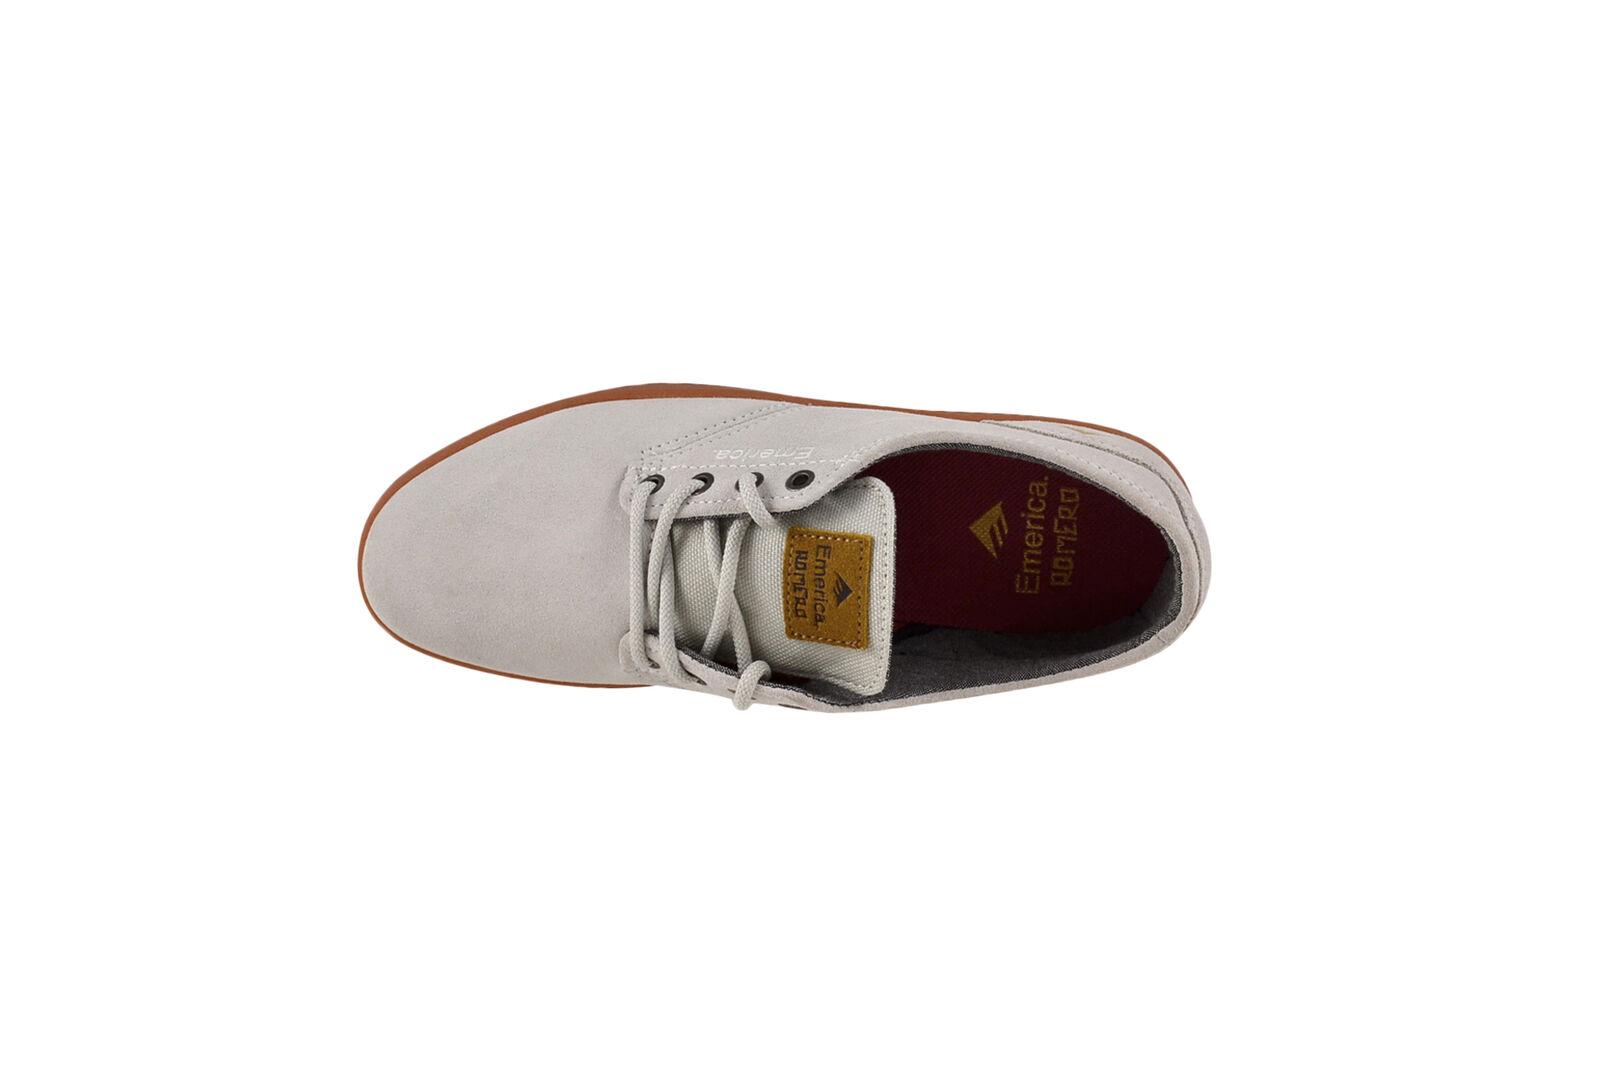 Emerica The Romero Schuhe Laced WEISS/gum Skater Sneaker Schuhe Romero weiß 114a8c